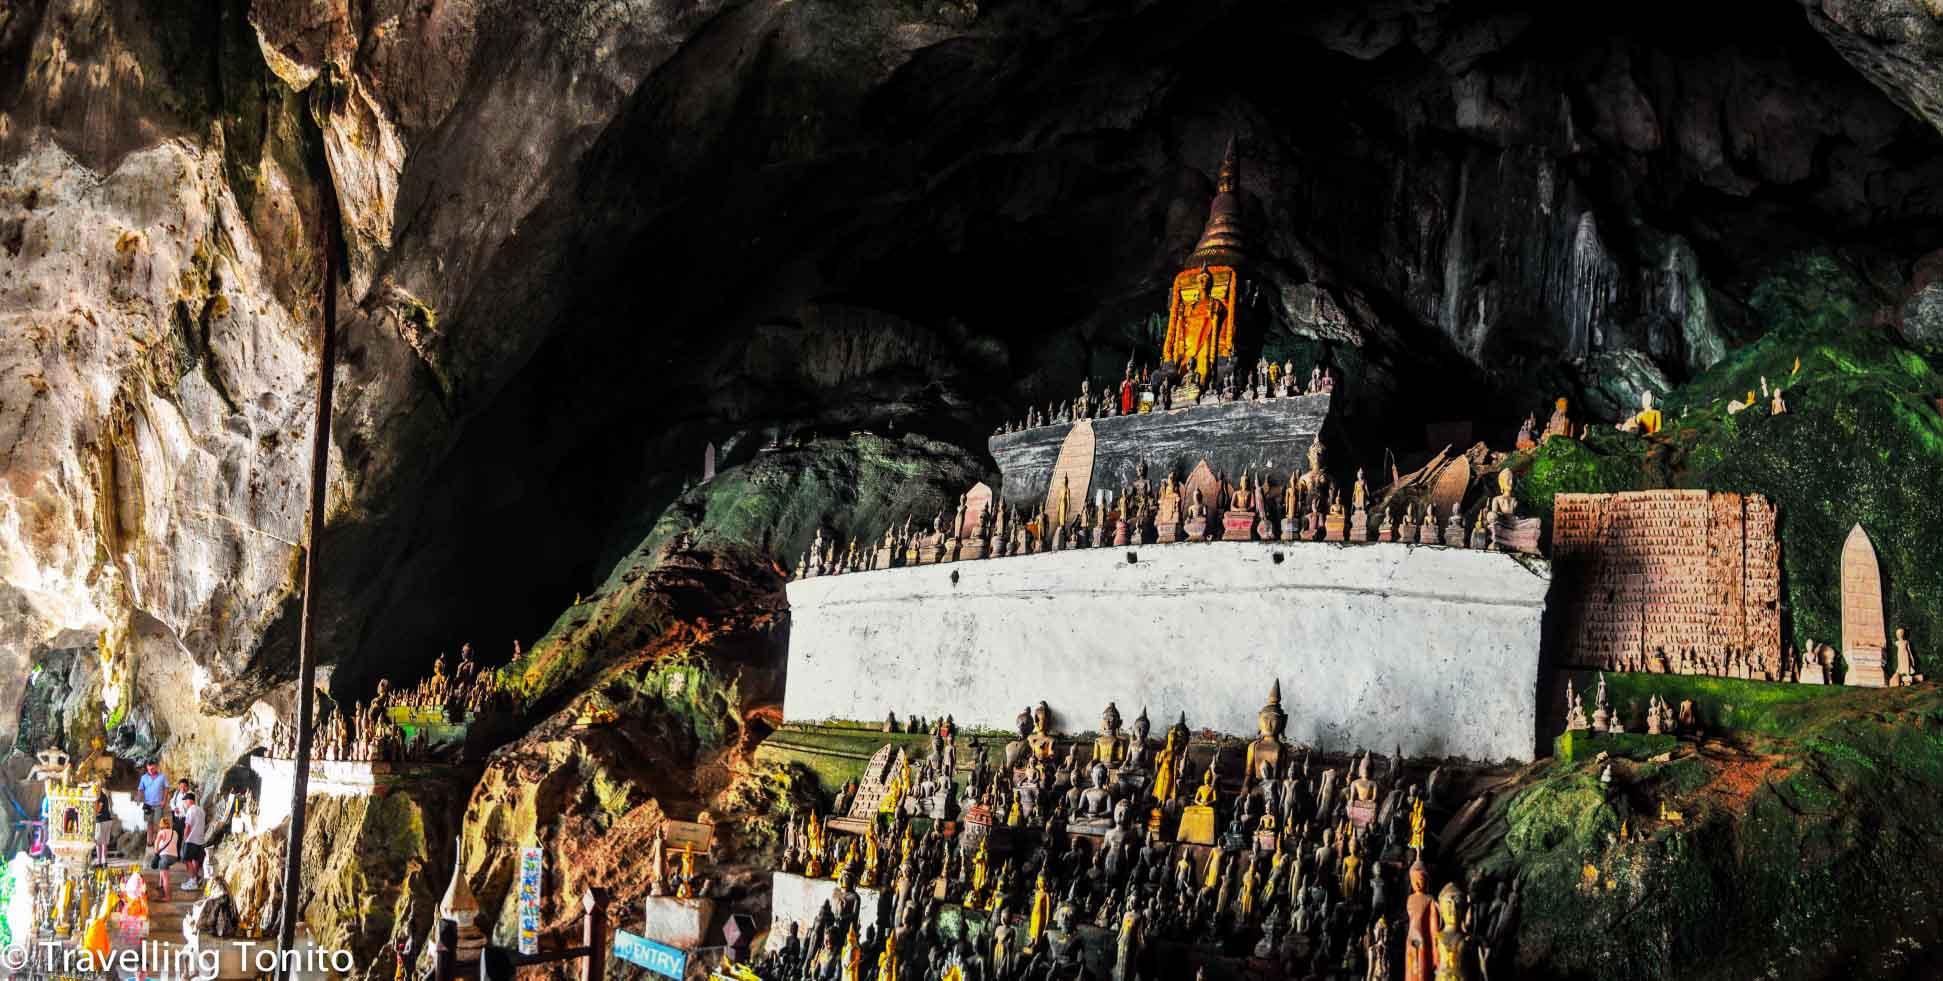 Tham Ting (Lower Cave) Photo: Travellingtonito